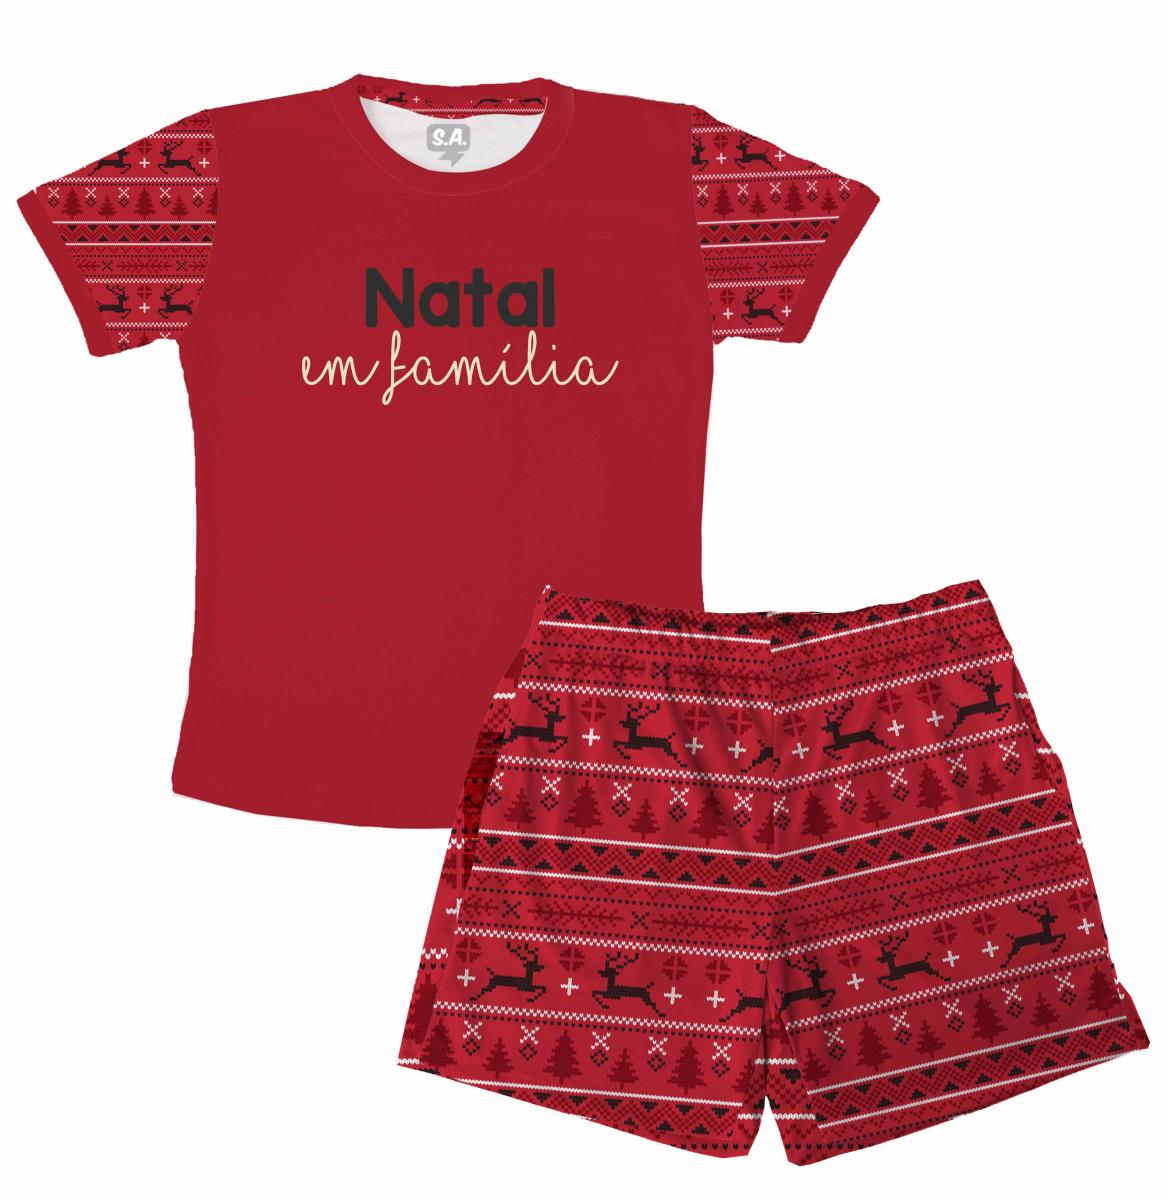 Pijama Masculino Malha Natal em Família